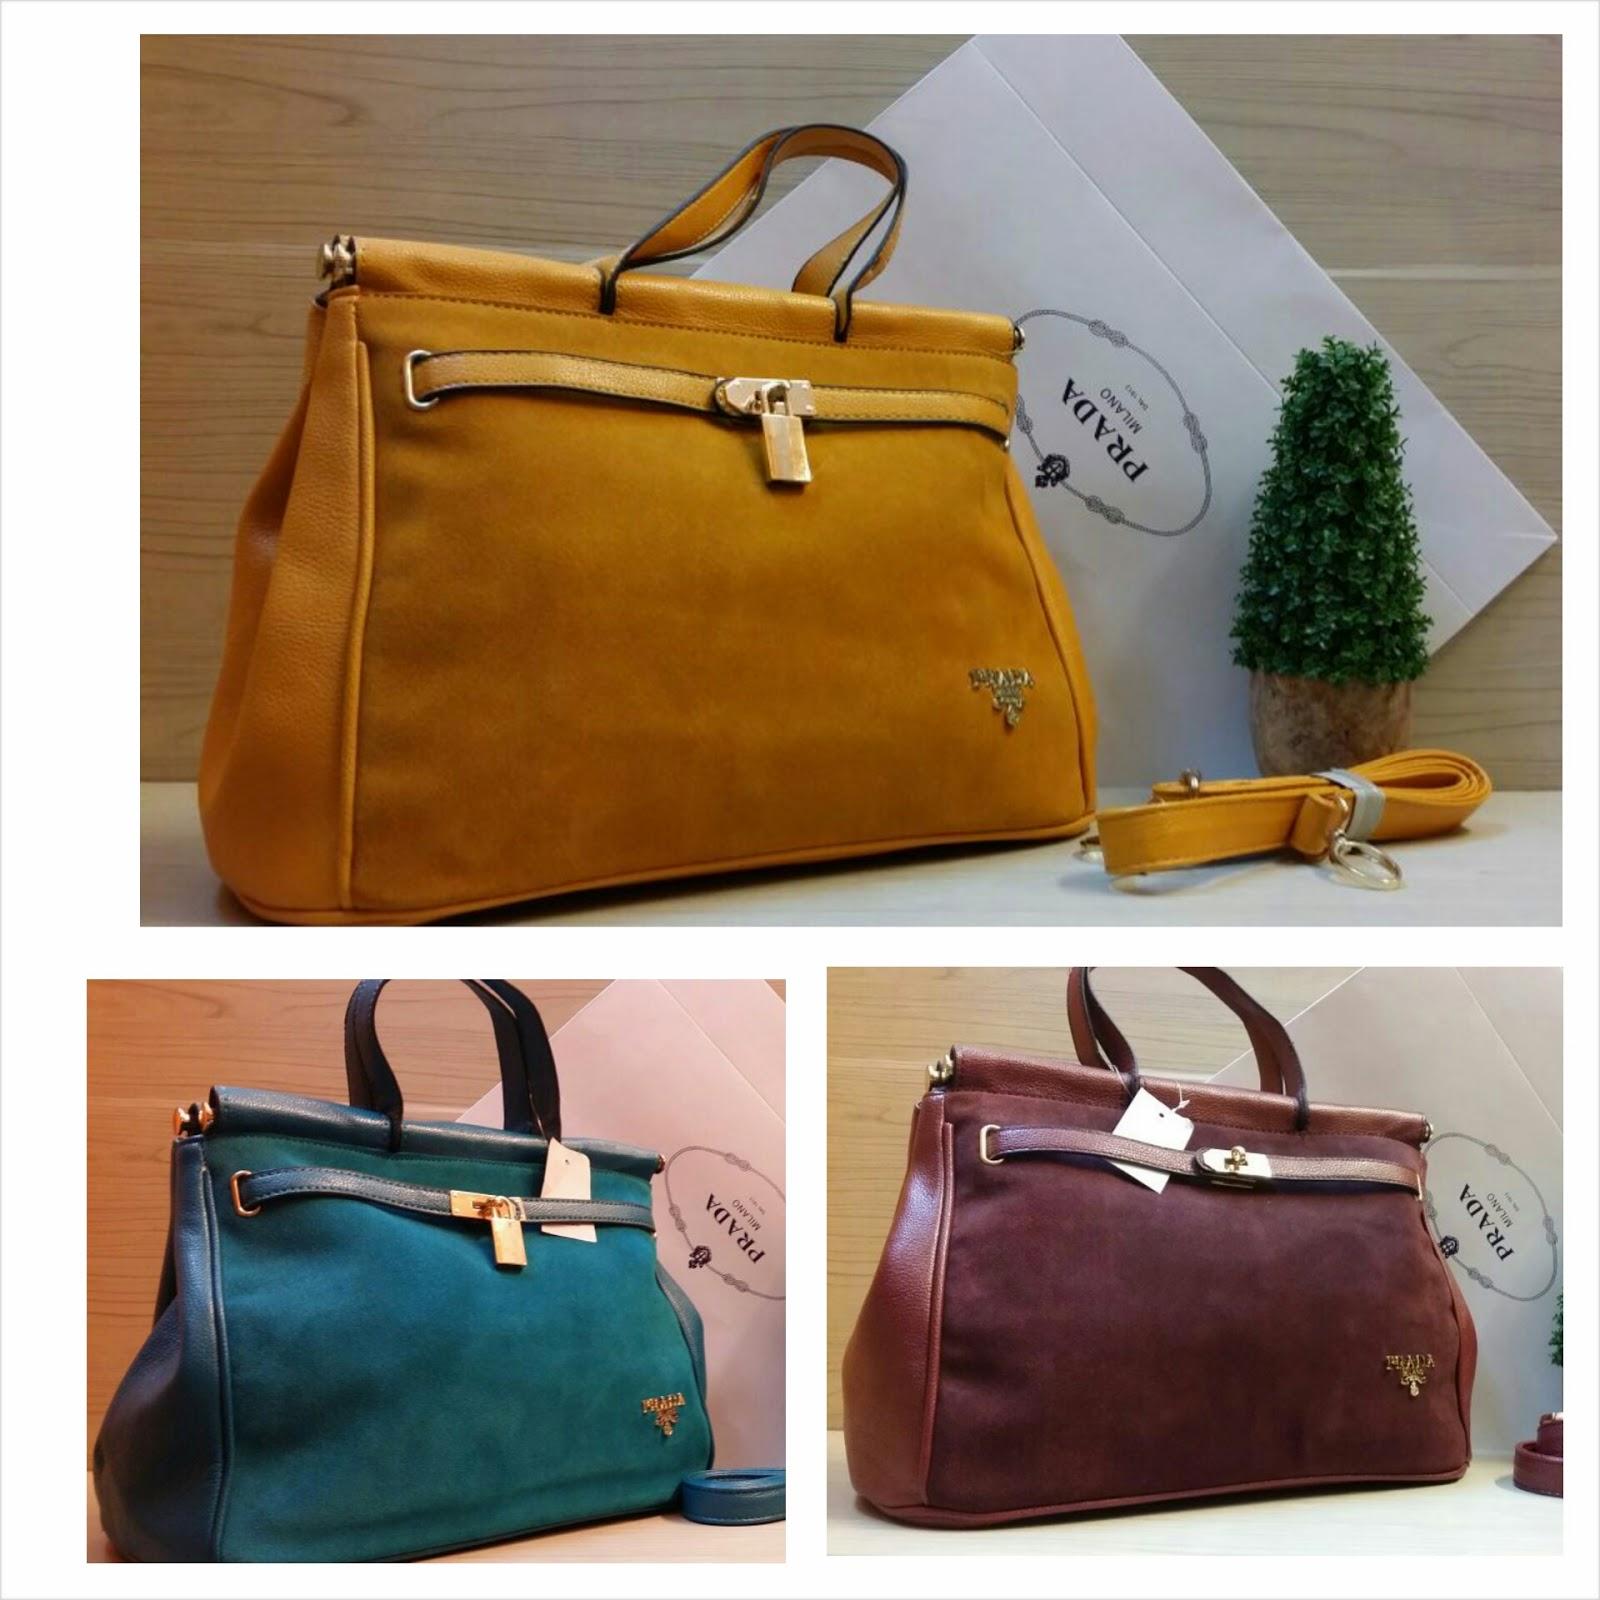 2441a33c1c4d Handbags & Closets: Beg Tangan Murah si PRADA yg Cunn